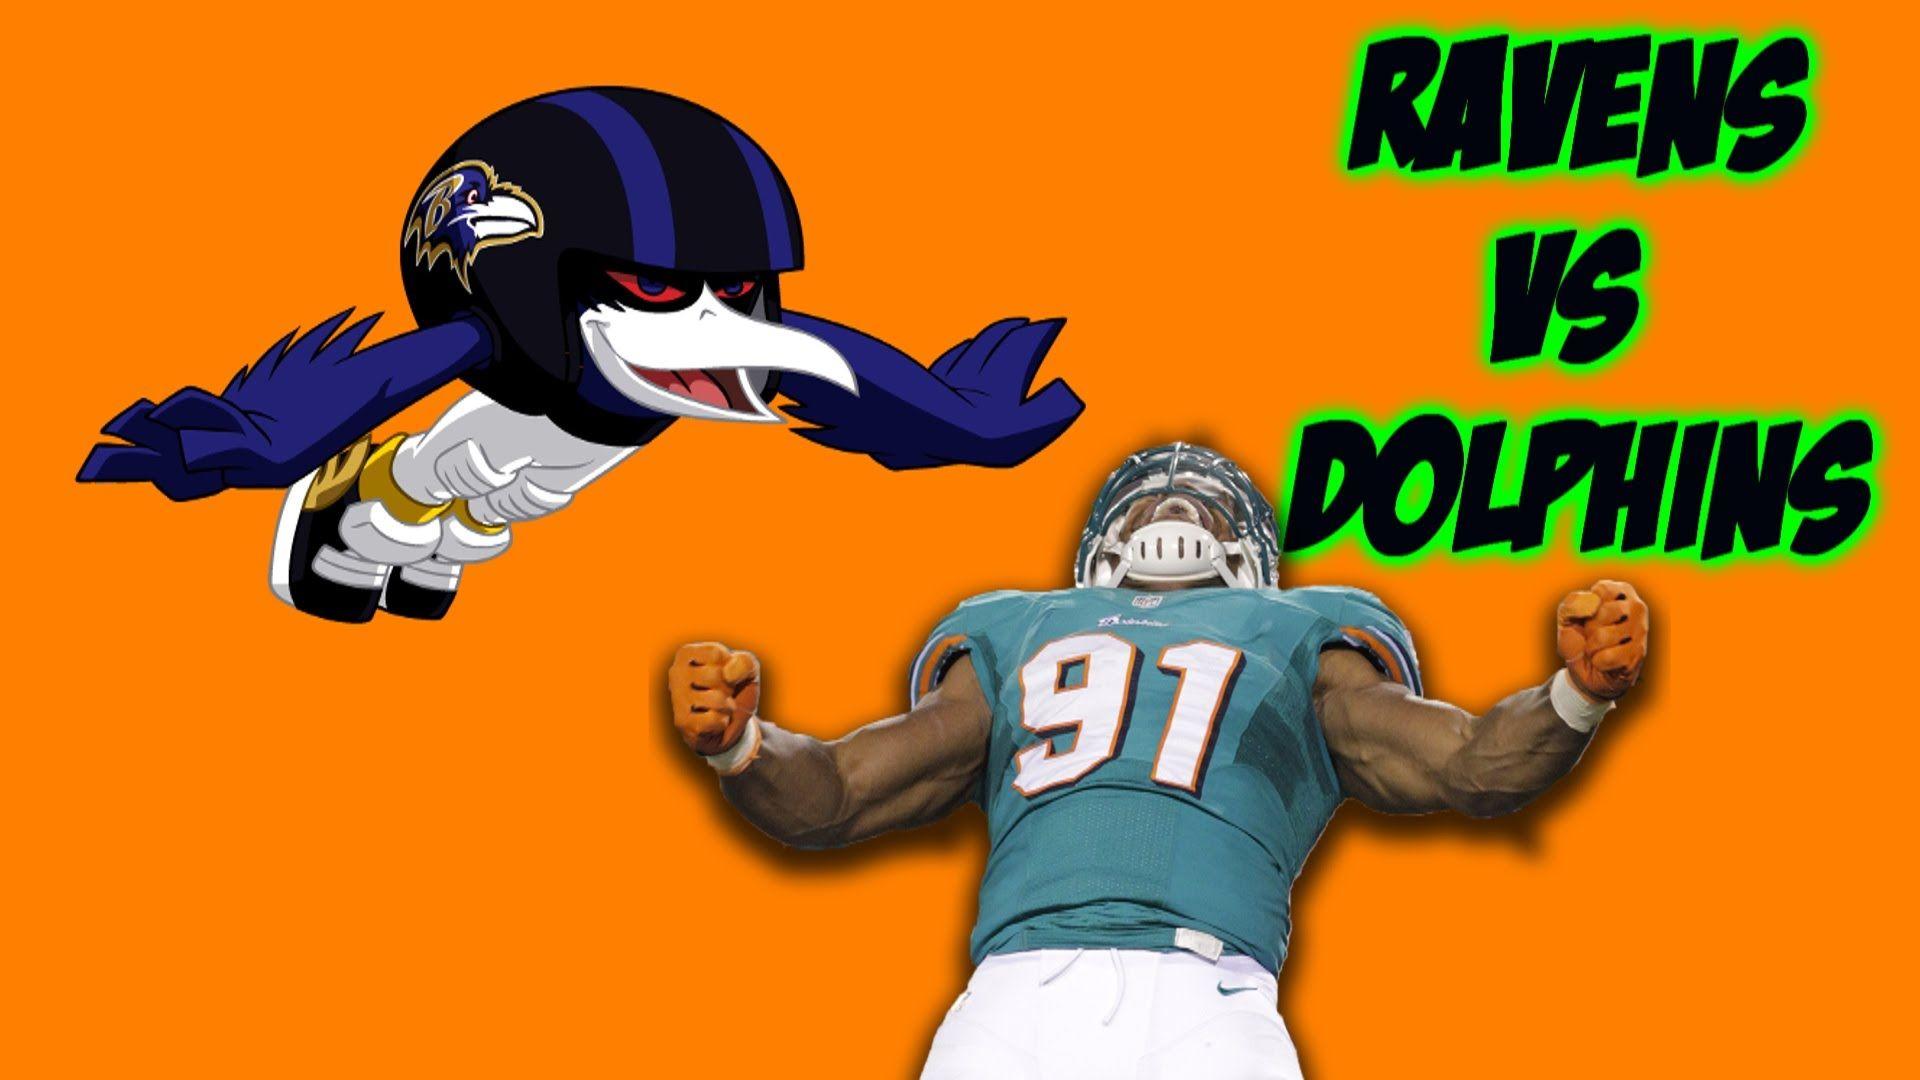 Madden 15 Ranked Match, Ravens VS. Dolphins, Unstoppable